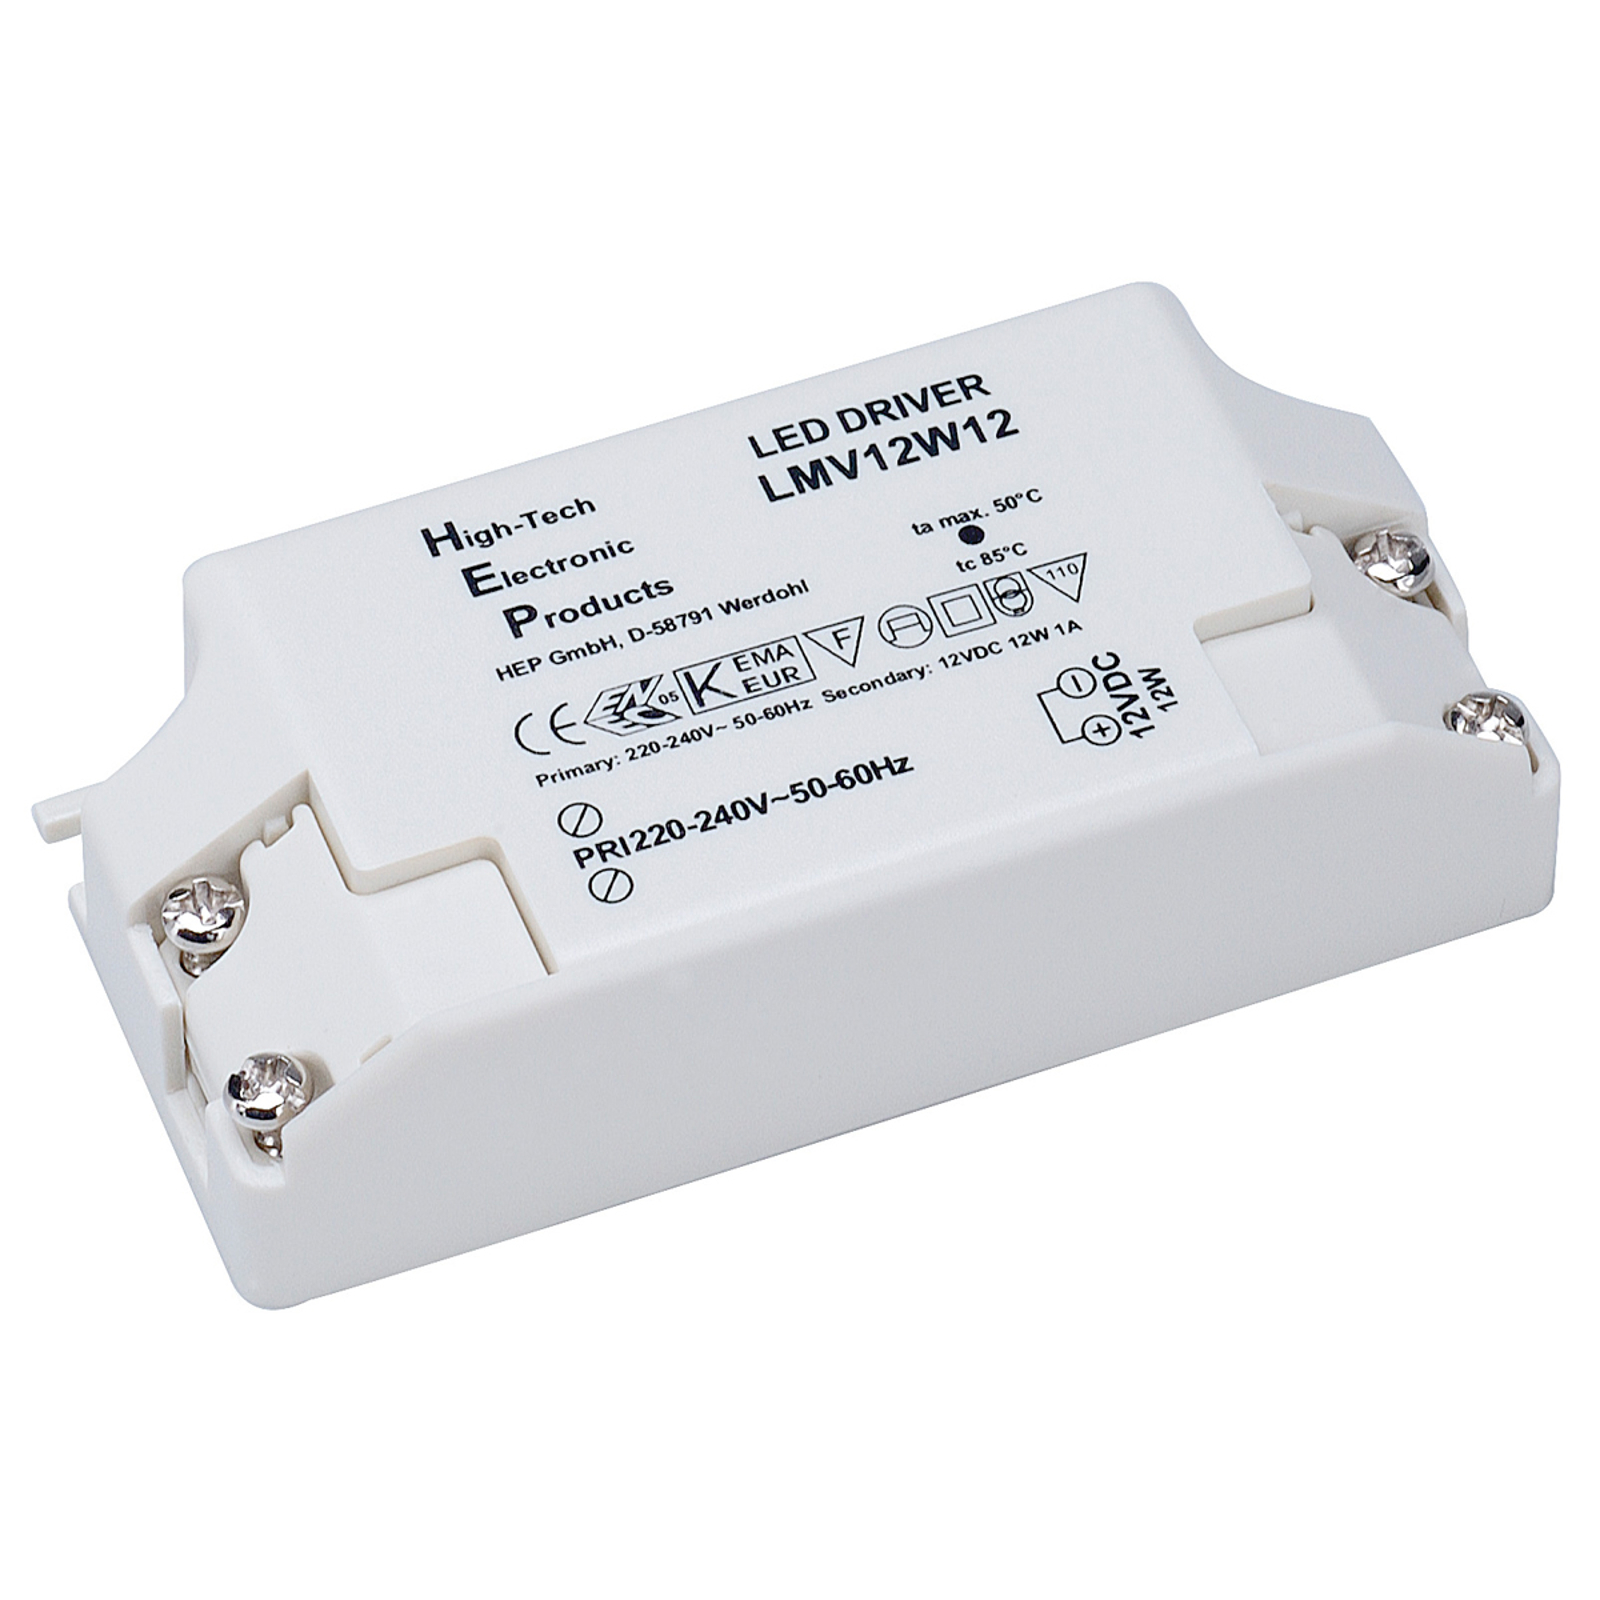 SLV LED Netzteil 12W, 12V